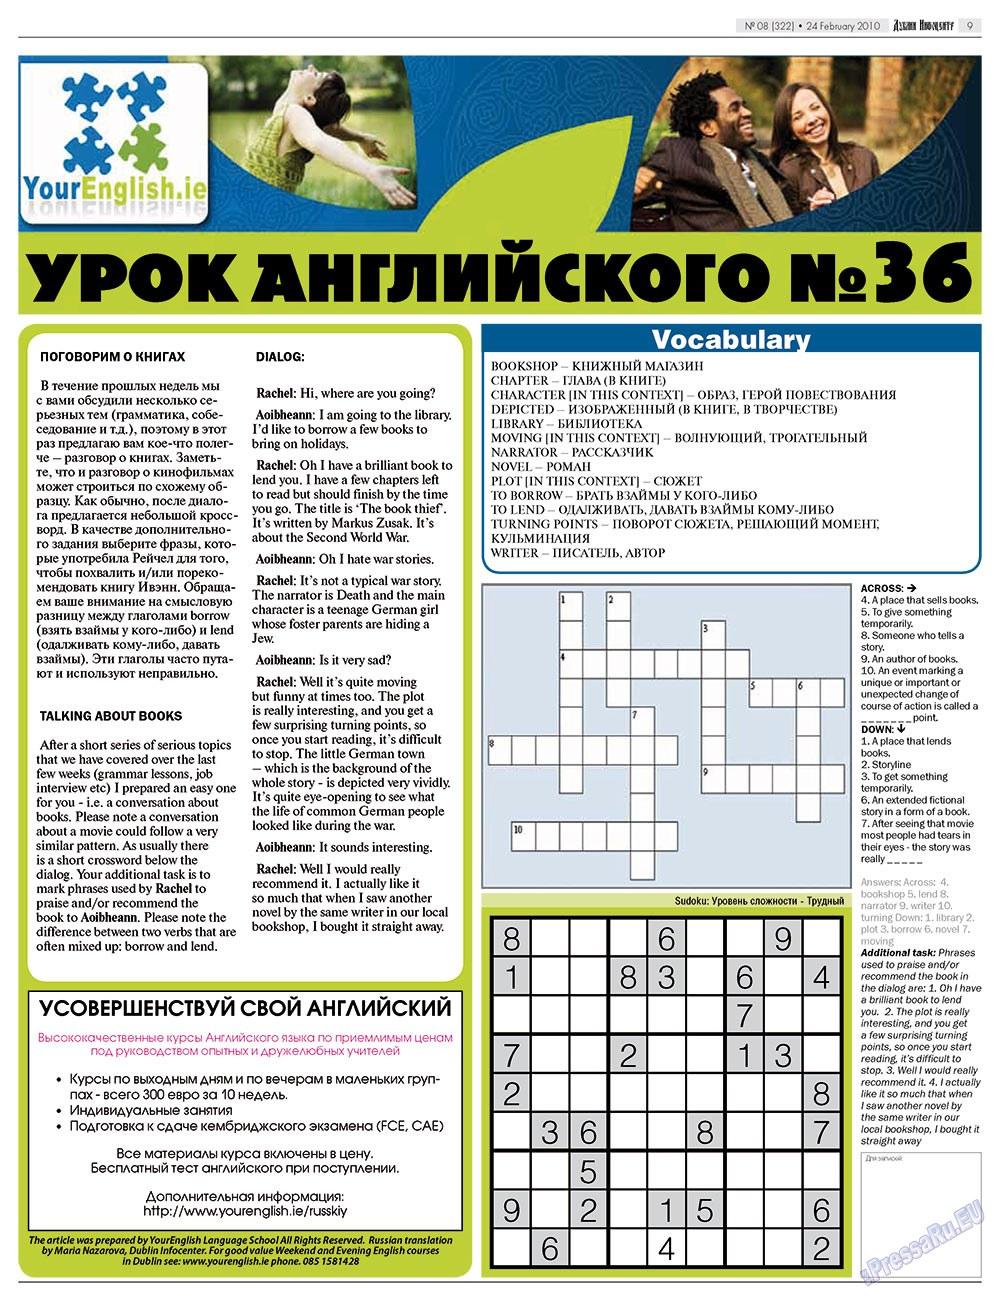 Дублин инфоцентр (газета). 2010 год, номер 8, стр. 9